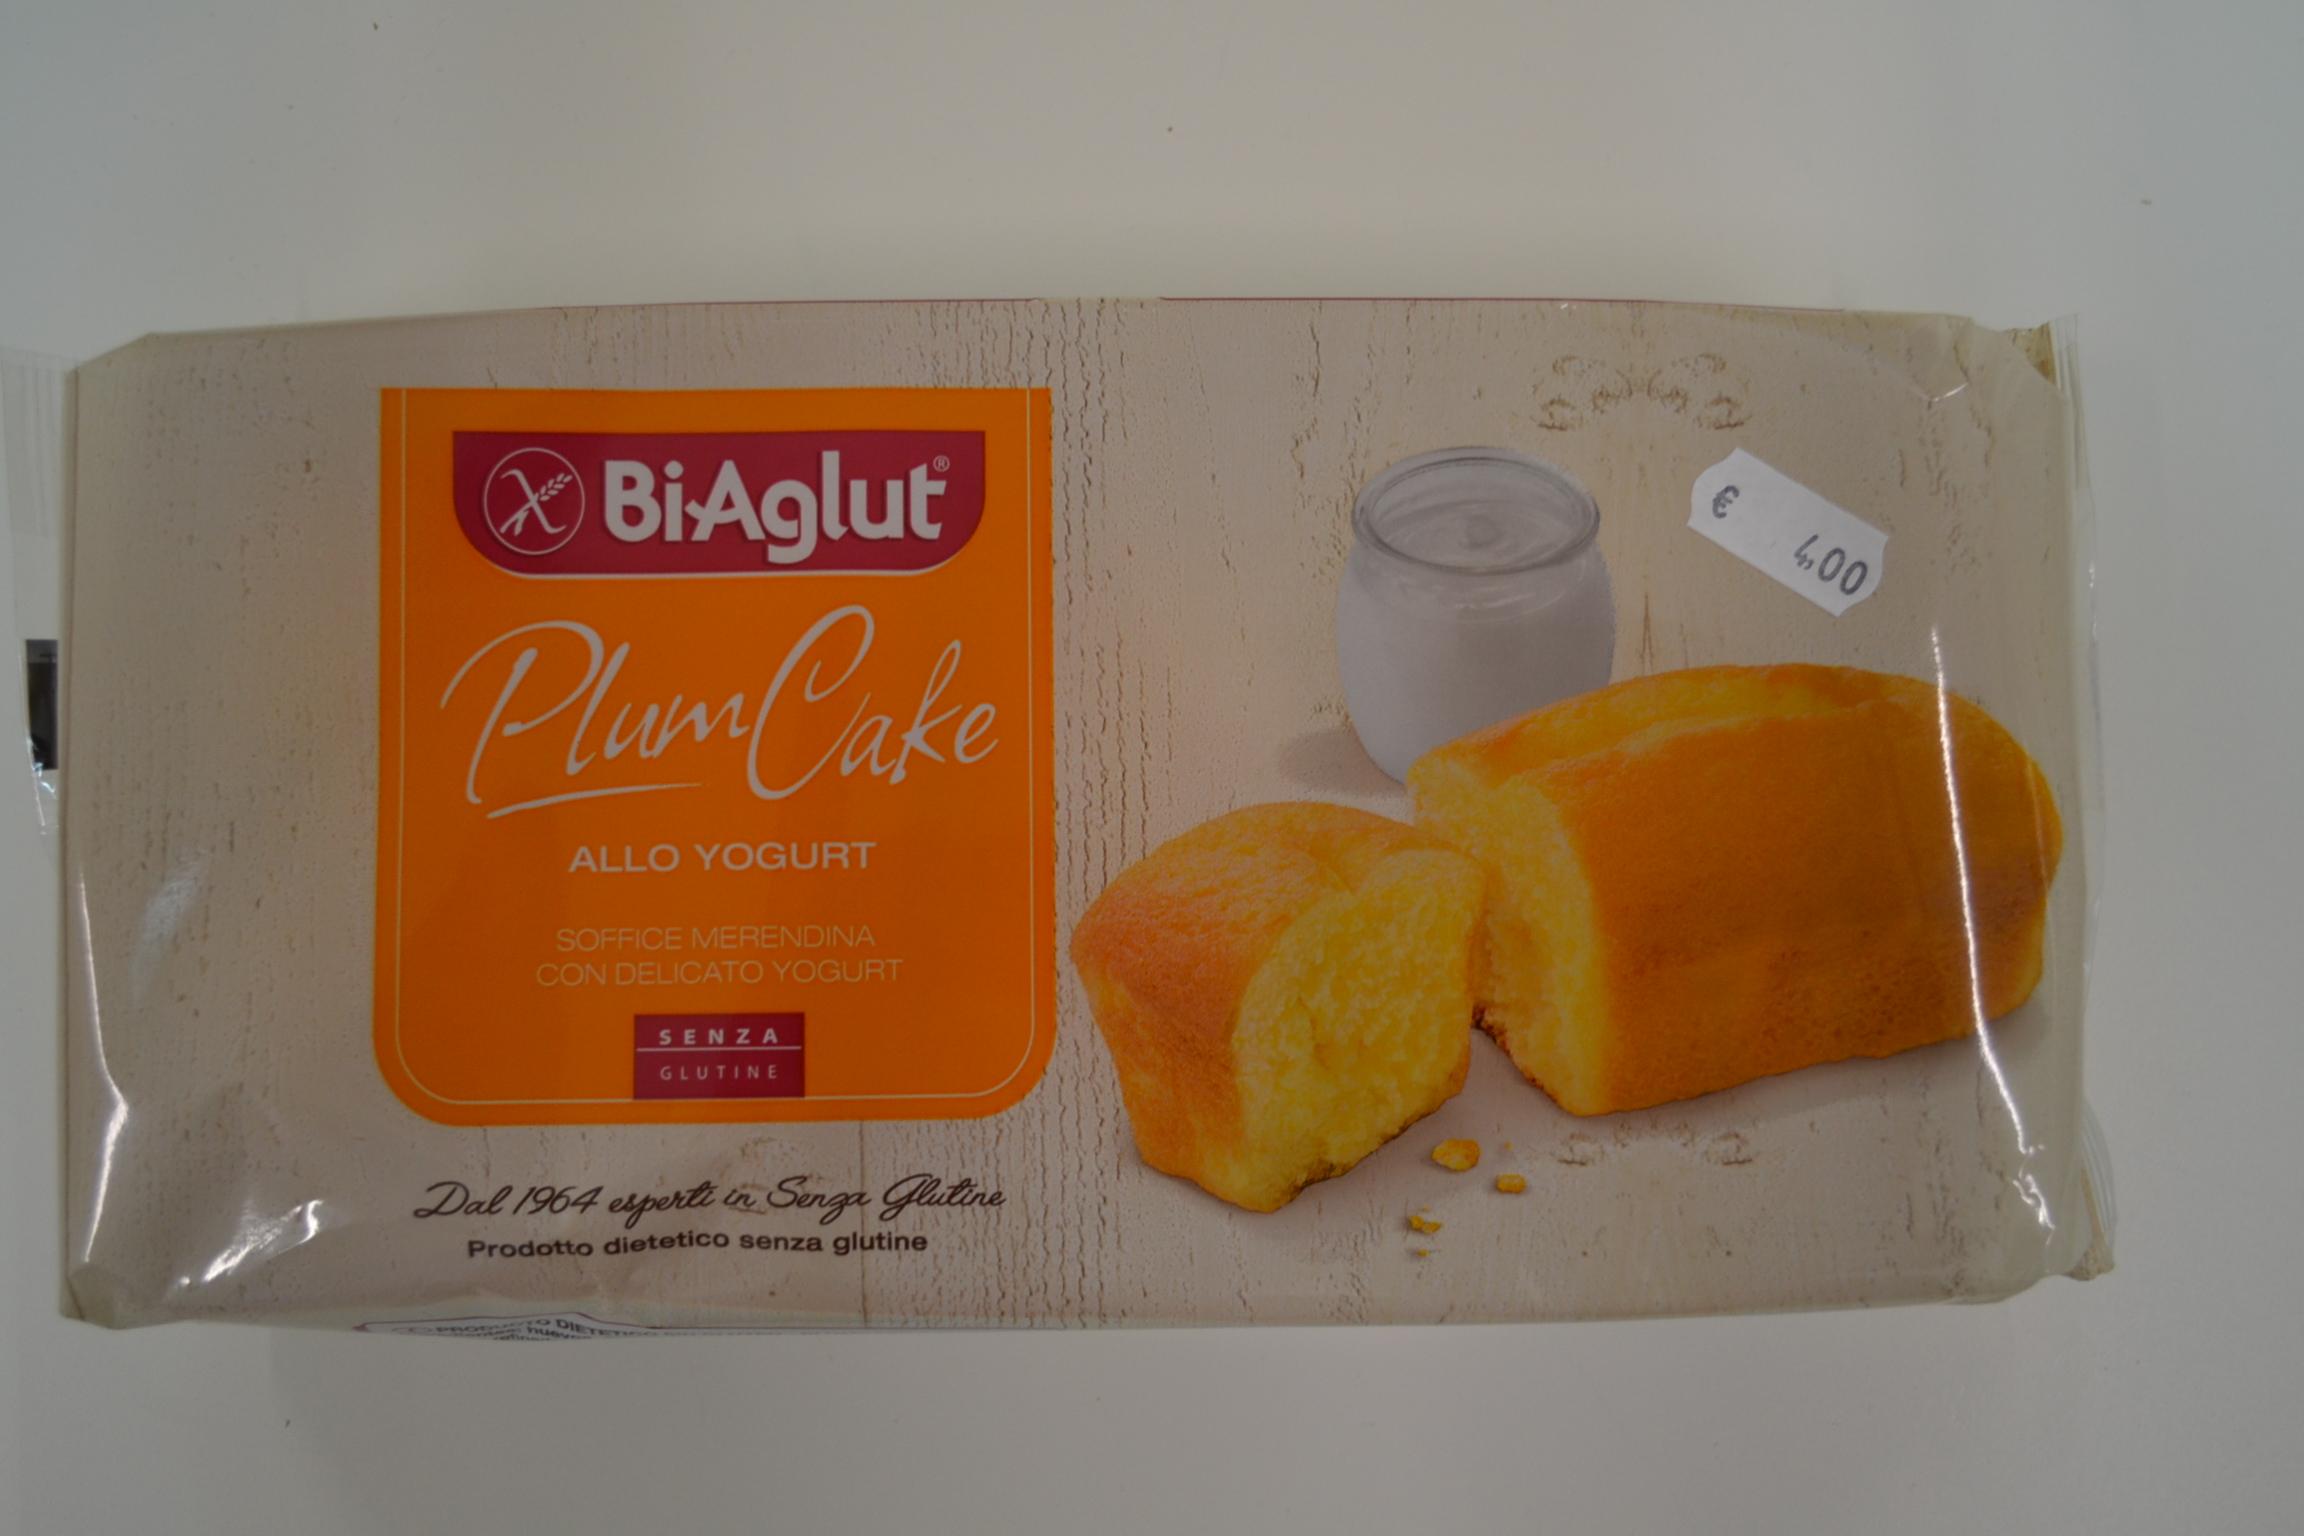 Plum Cake allo yogurt BIAGLUT